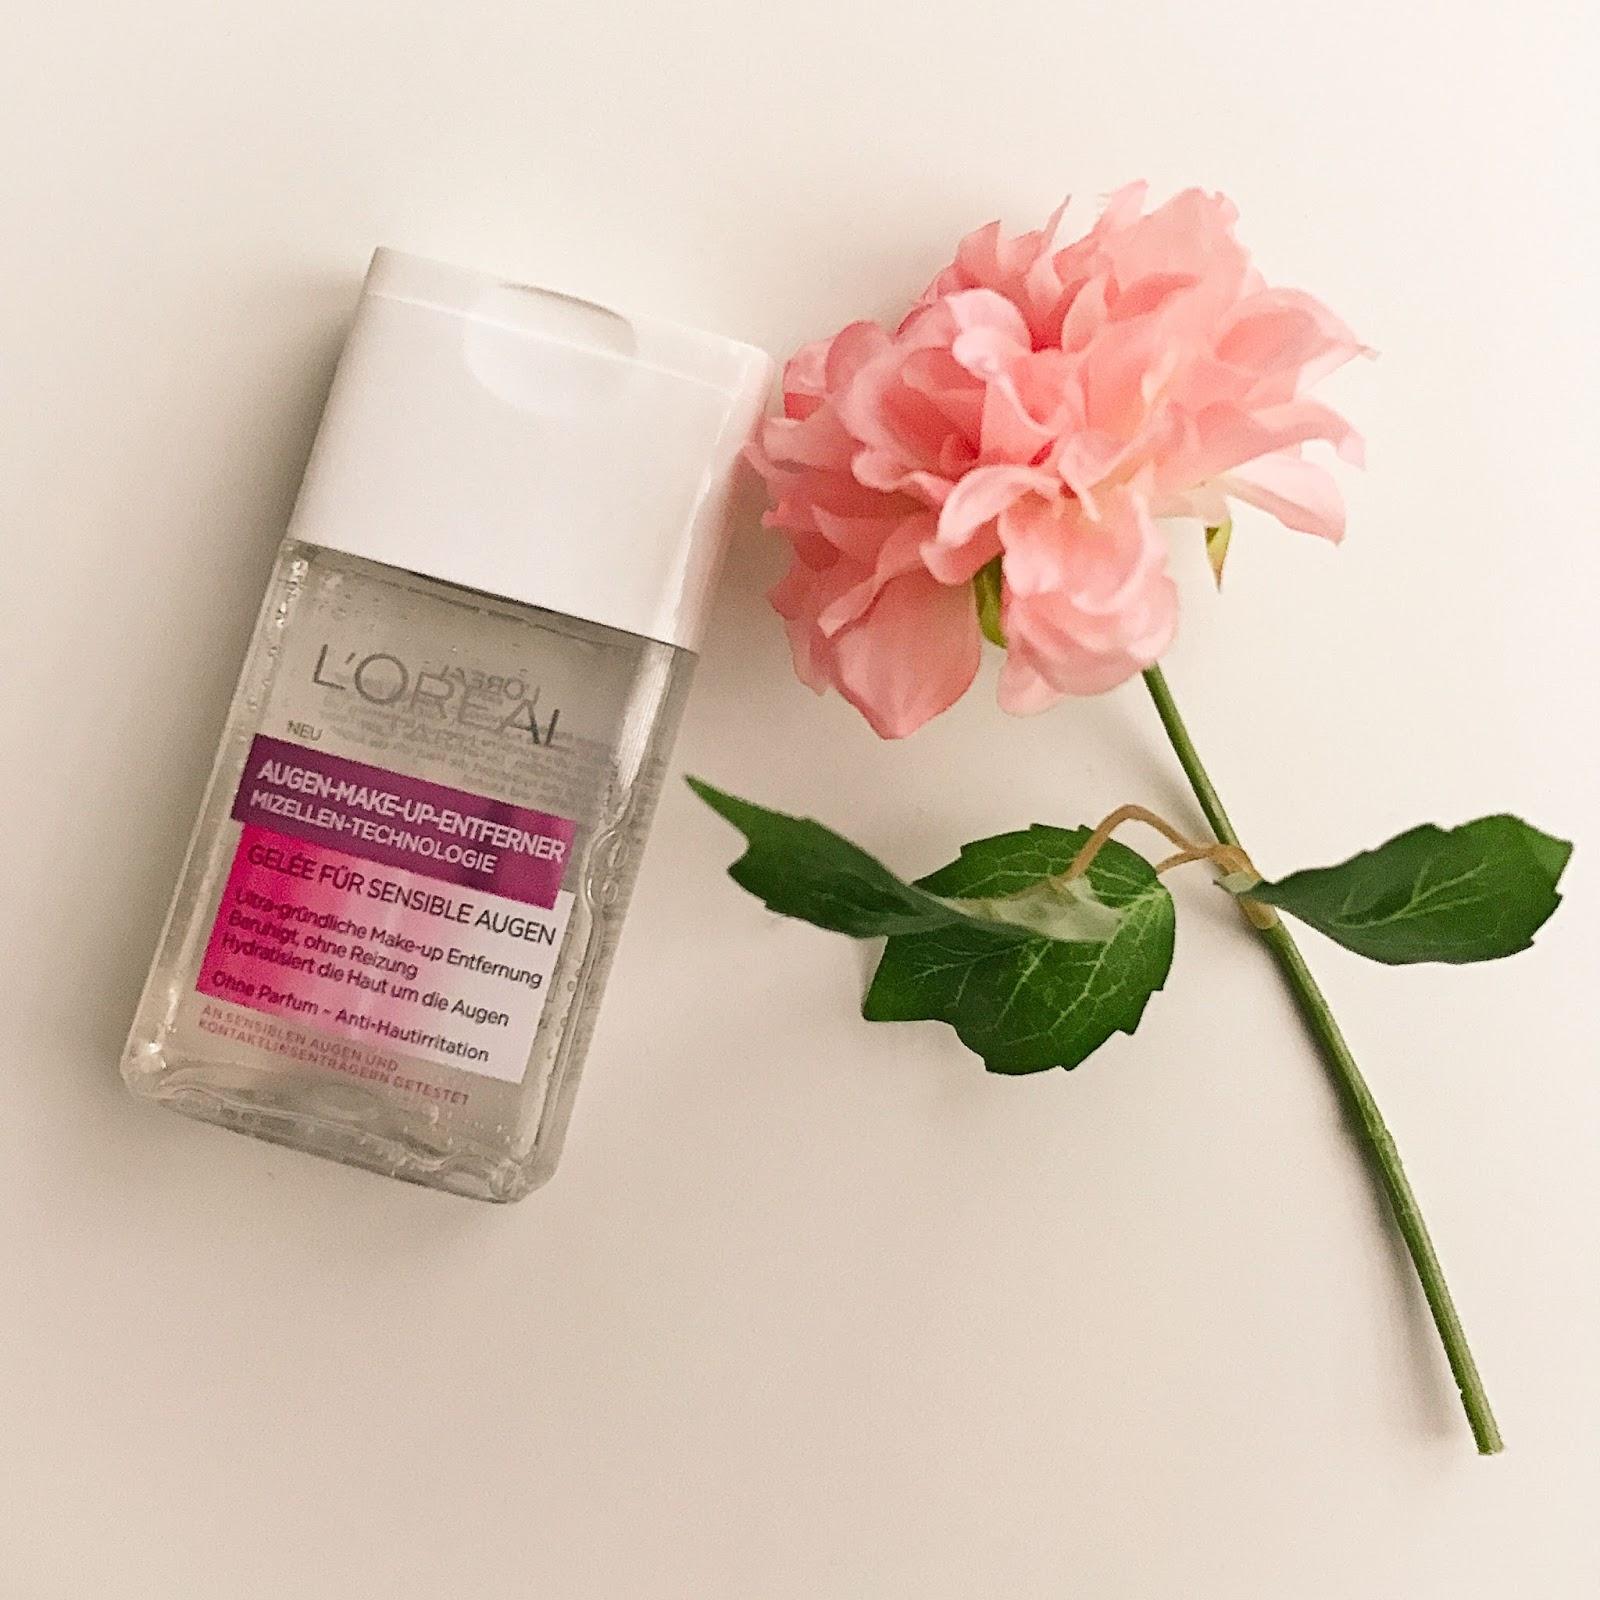 Żel micelarny  L'Oréal, L'Oréal, Ideal Soft Żel micelarny do demakijażu oczu, żel, micelarny, demakijaż oczu,